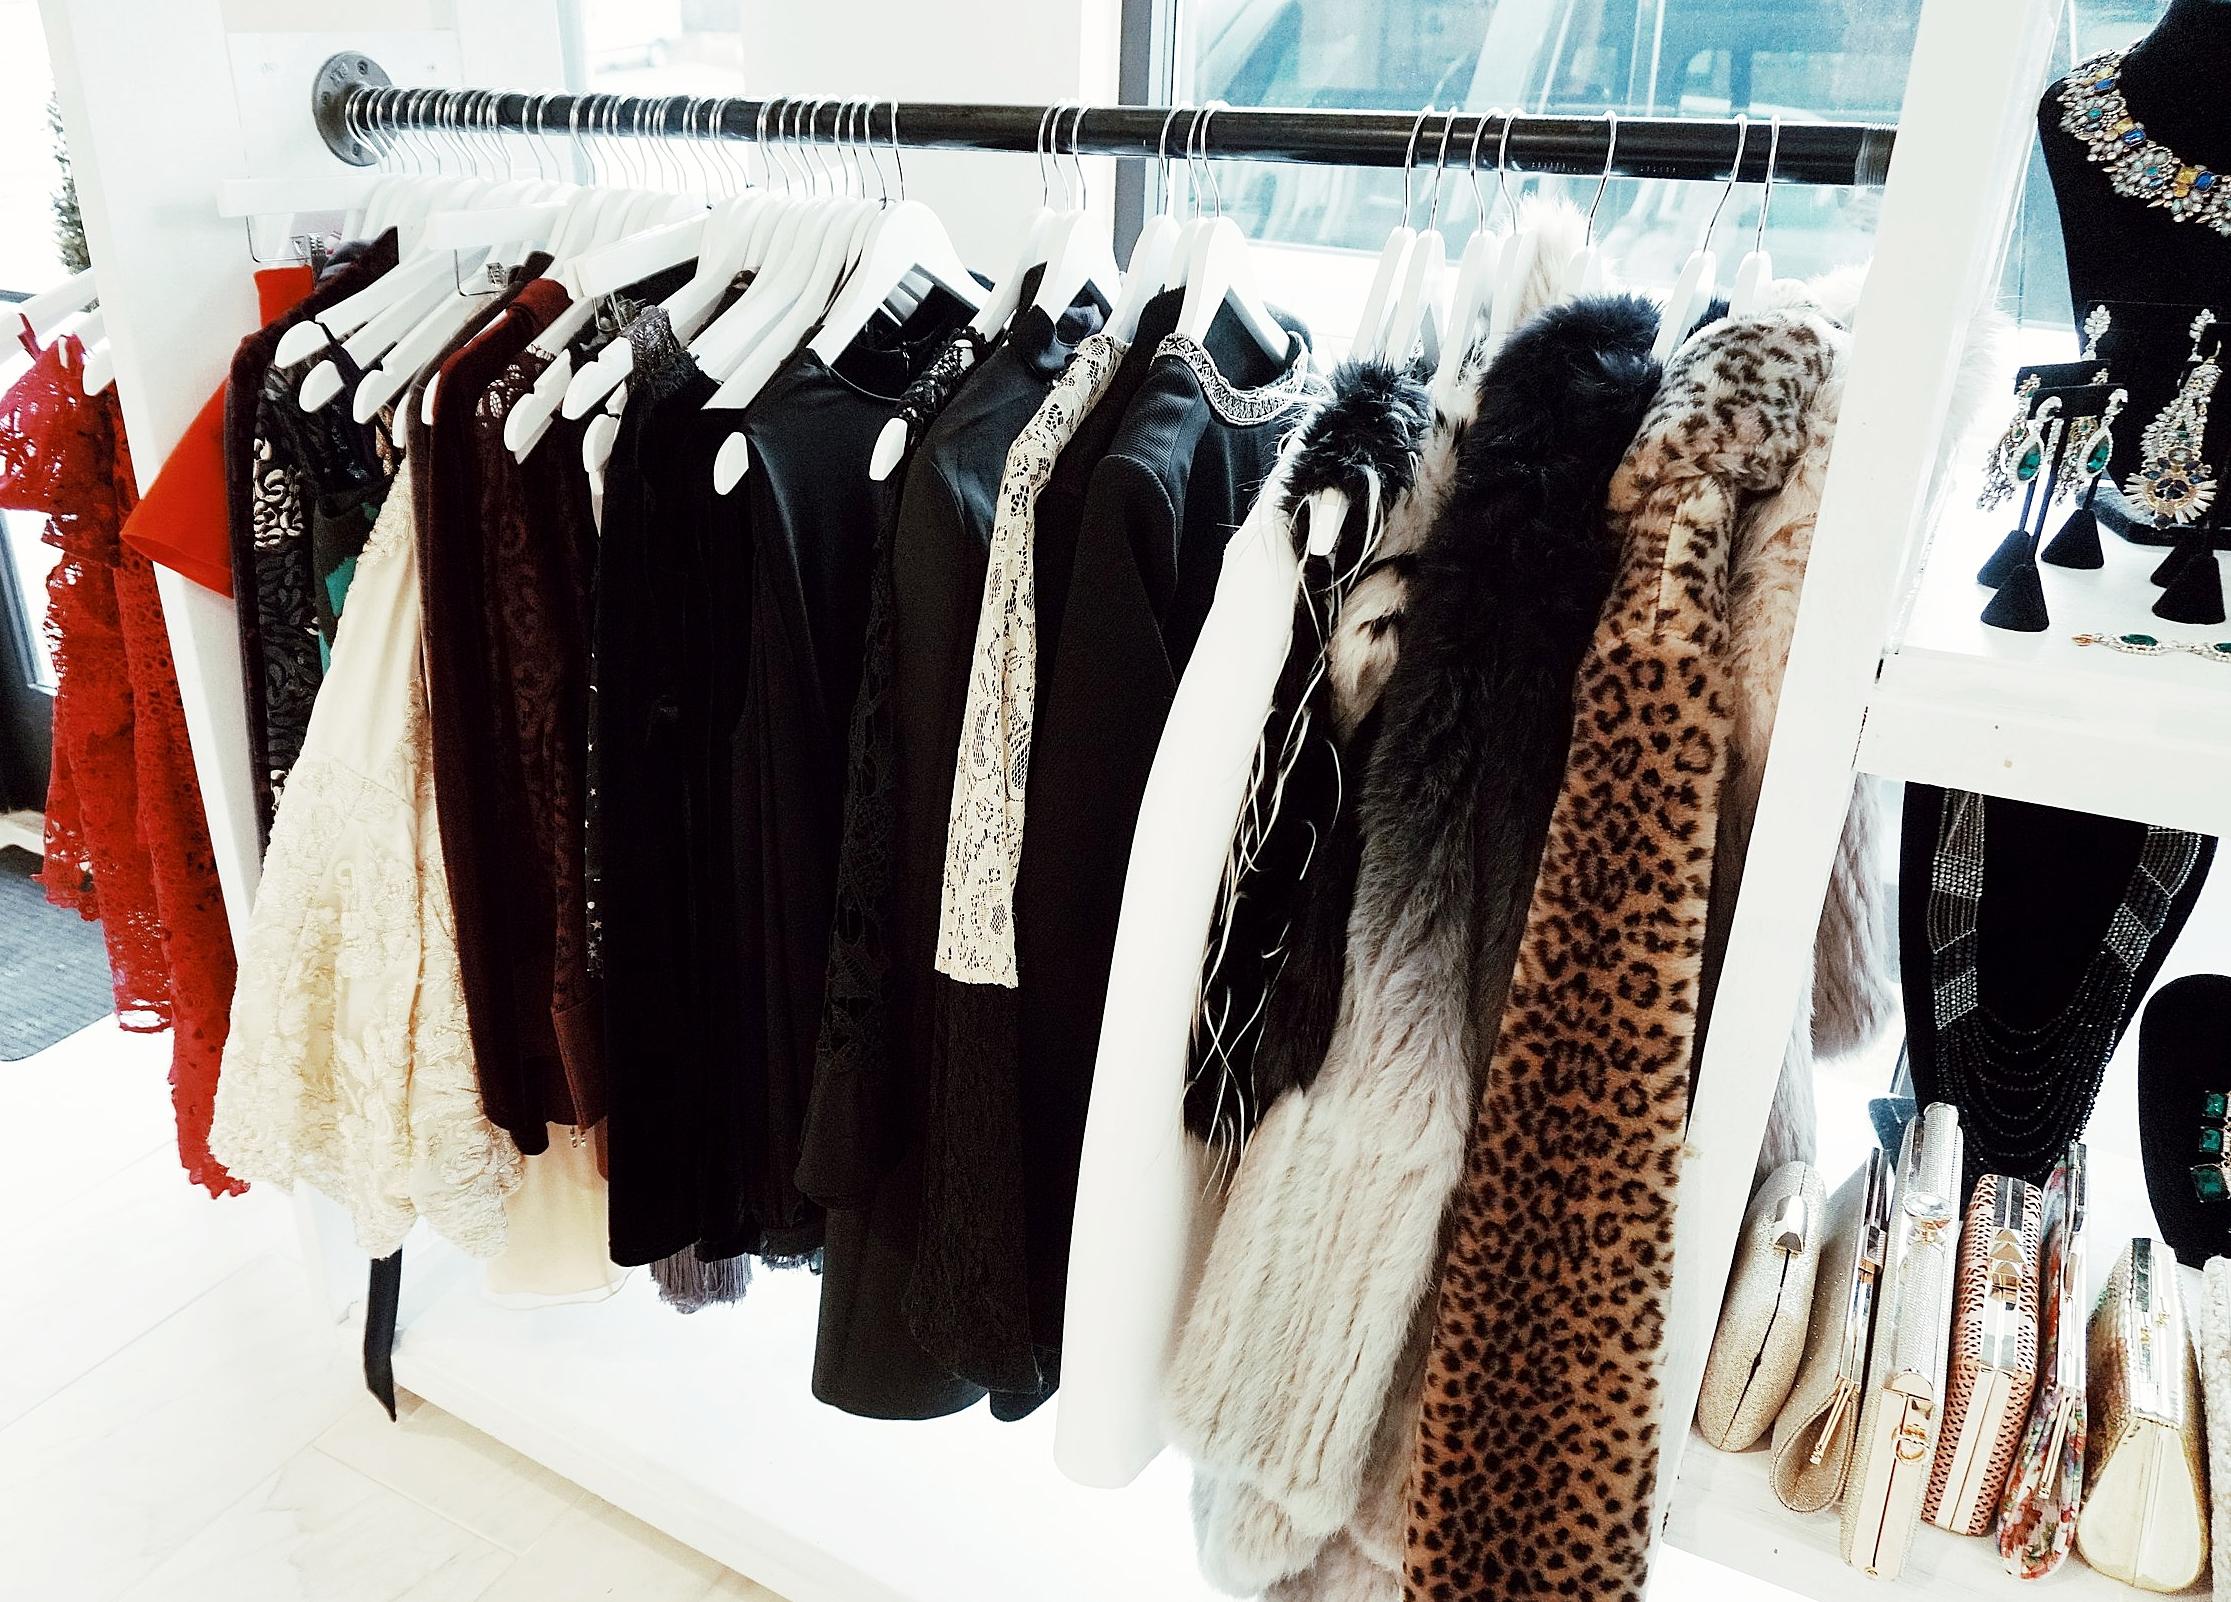 the-showroom-nashville-high-end-fashion-rentals-where-to-shop.jpg